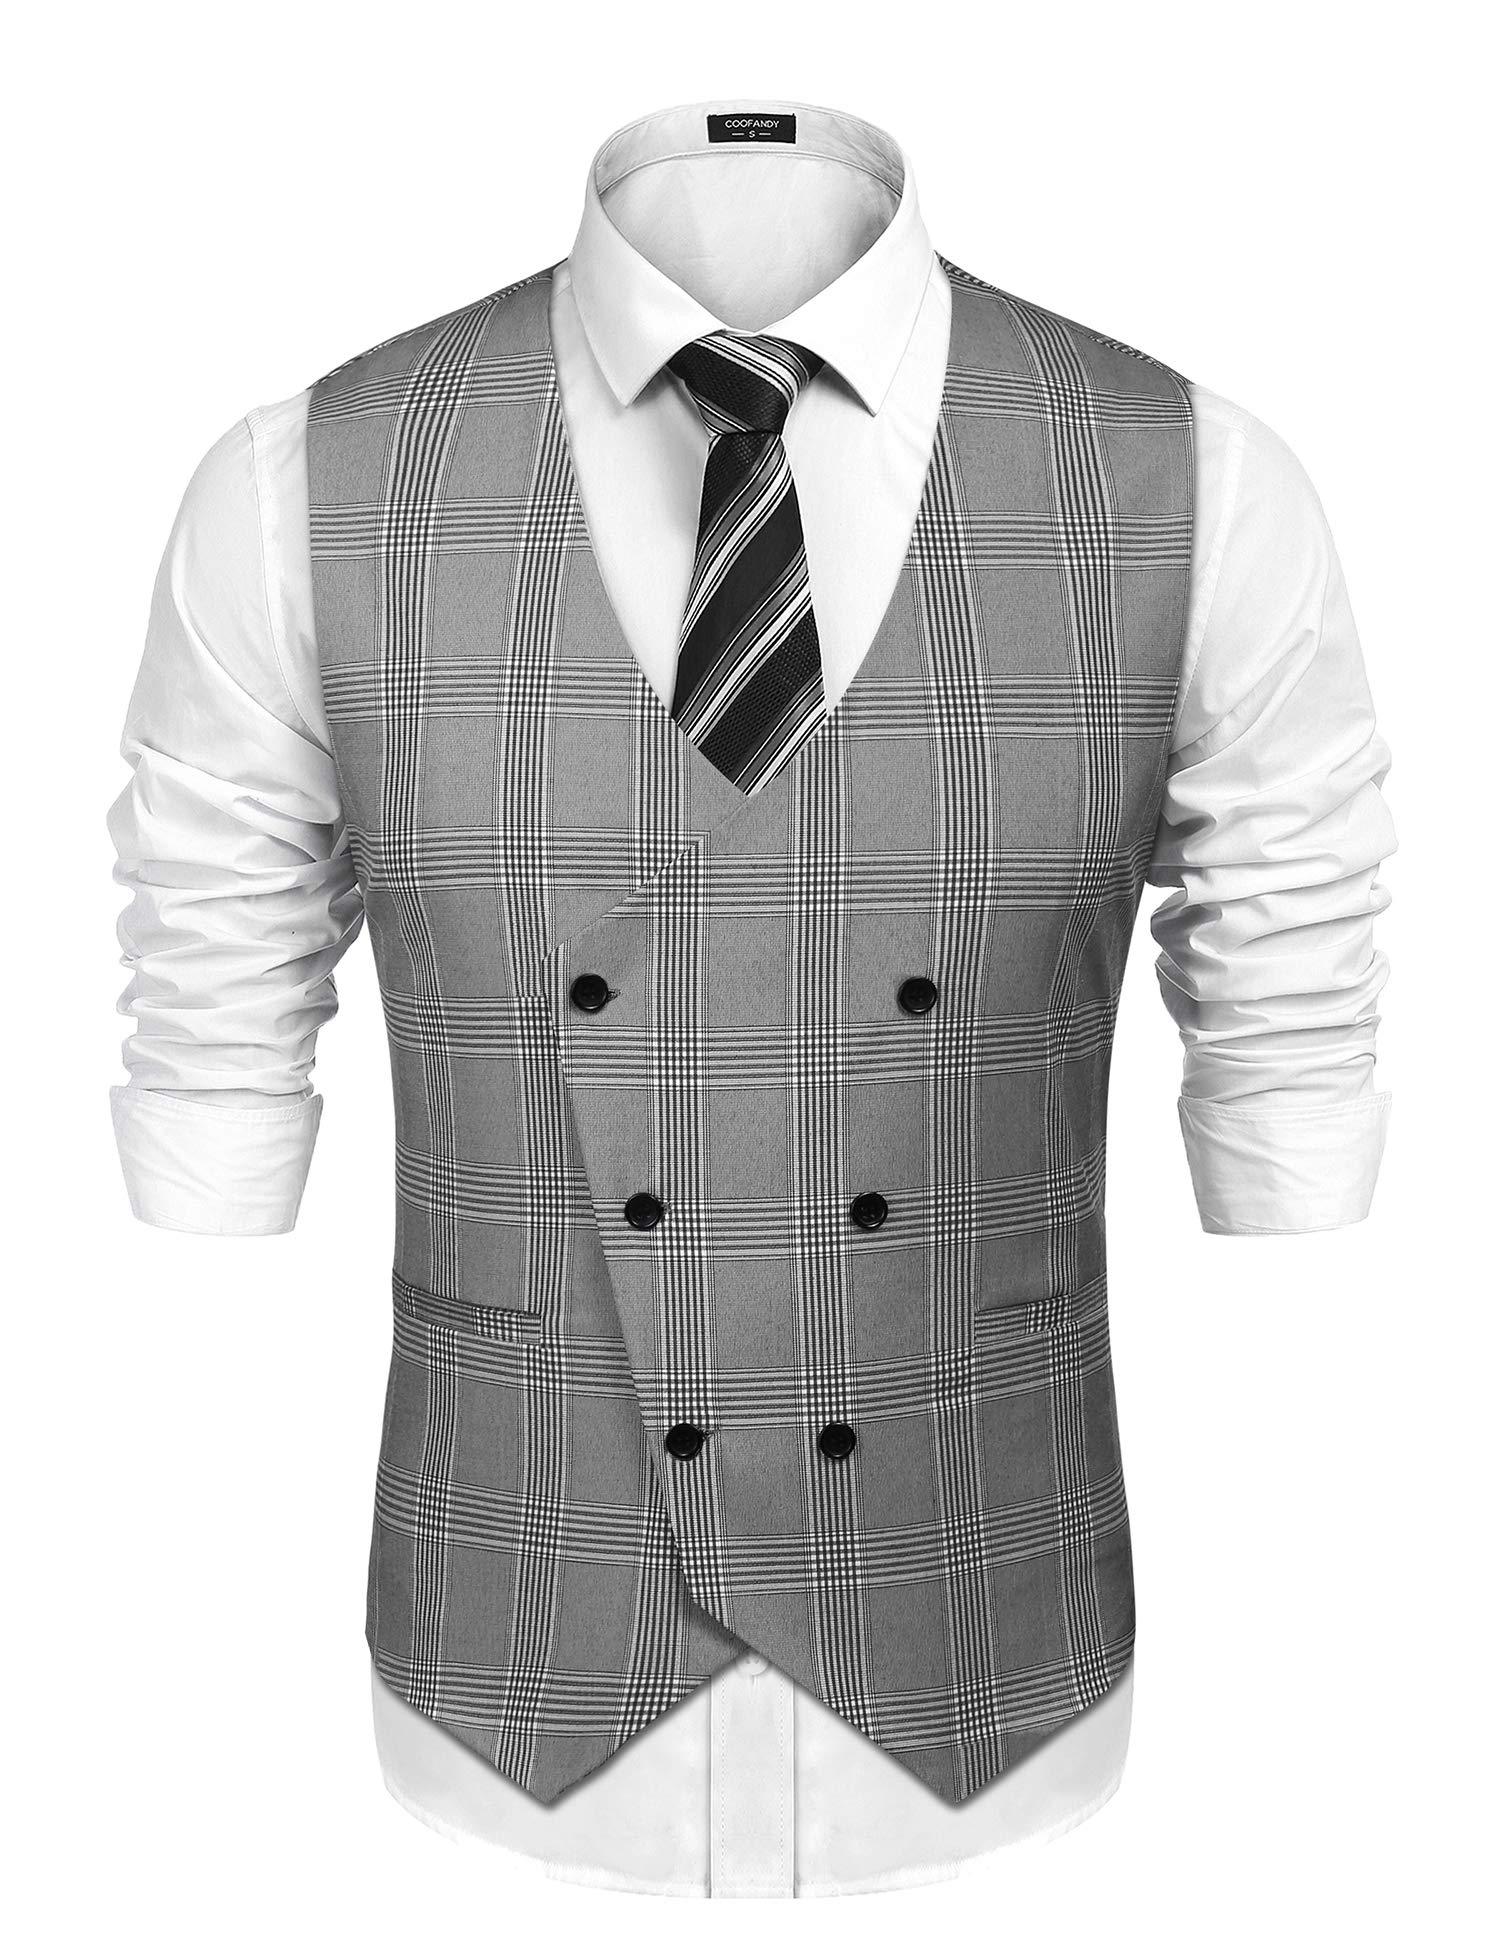 COOFANDY Men's V-Neck Sleeveless Slim Fit Vest Jacket Business Suit Dress Vest, Grey, X-Large